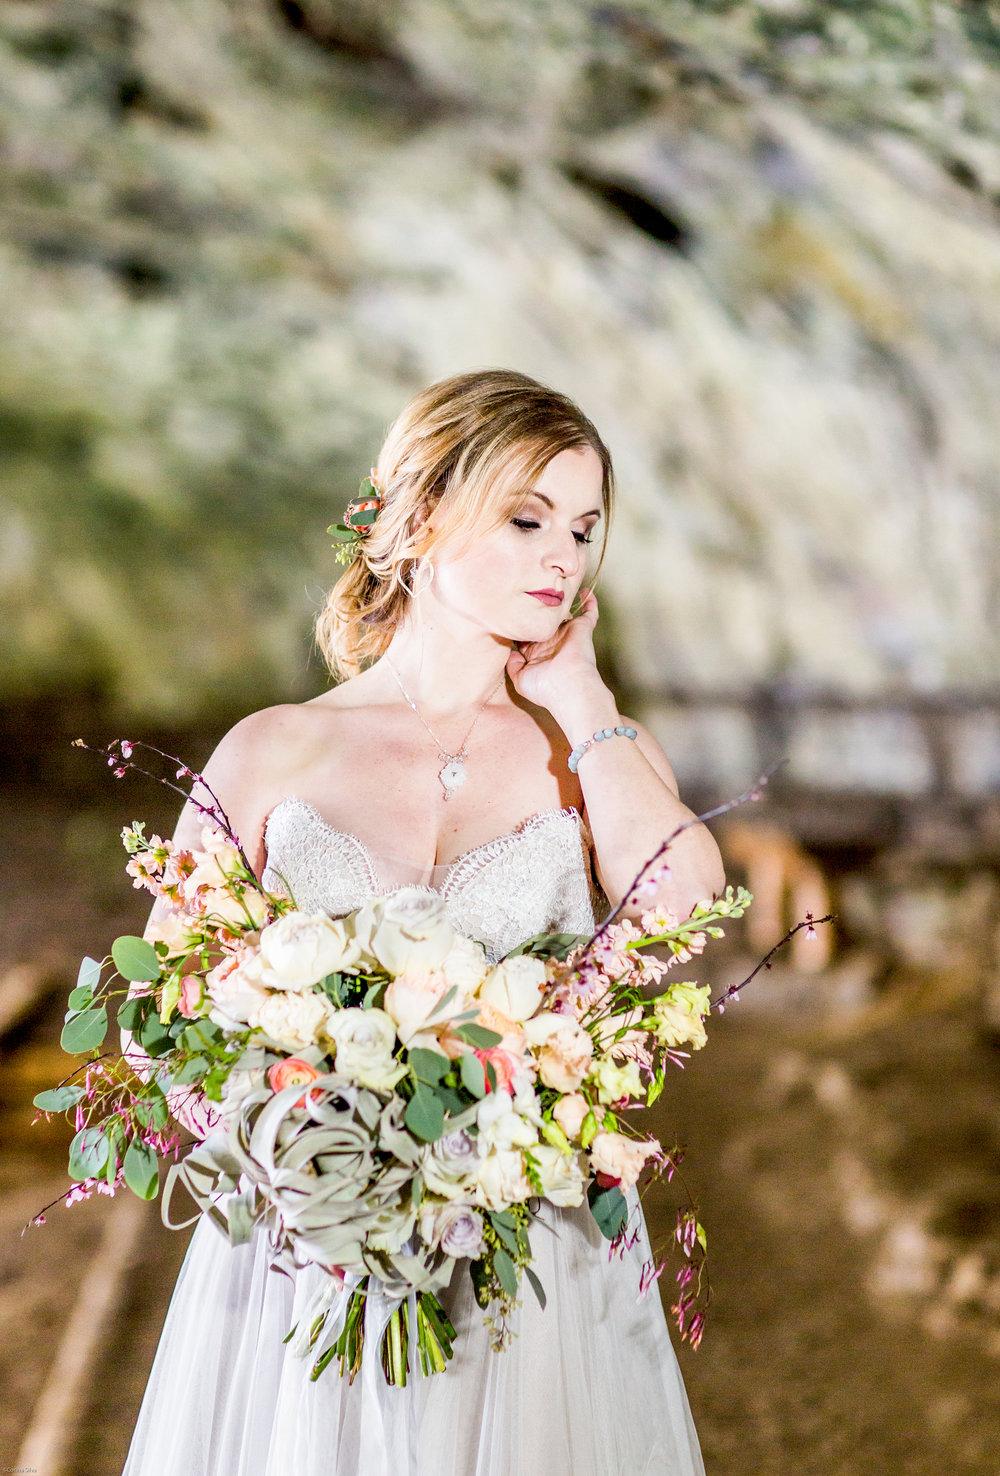 Silver Falls-elopement-bride-and-groom-photo Corina Silva Studios-17.jpg